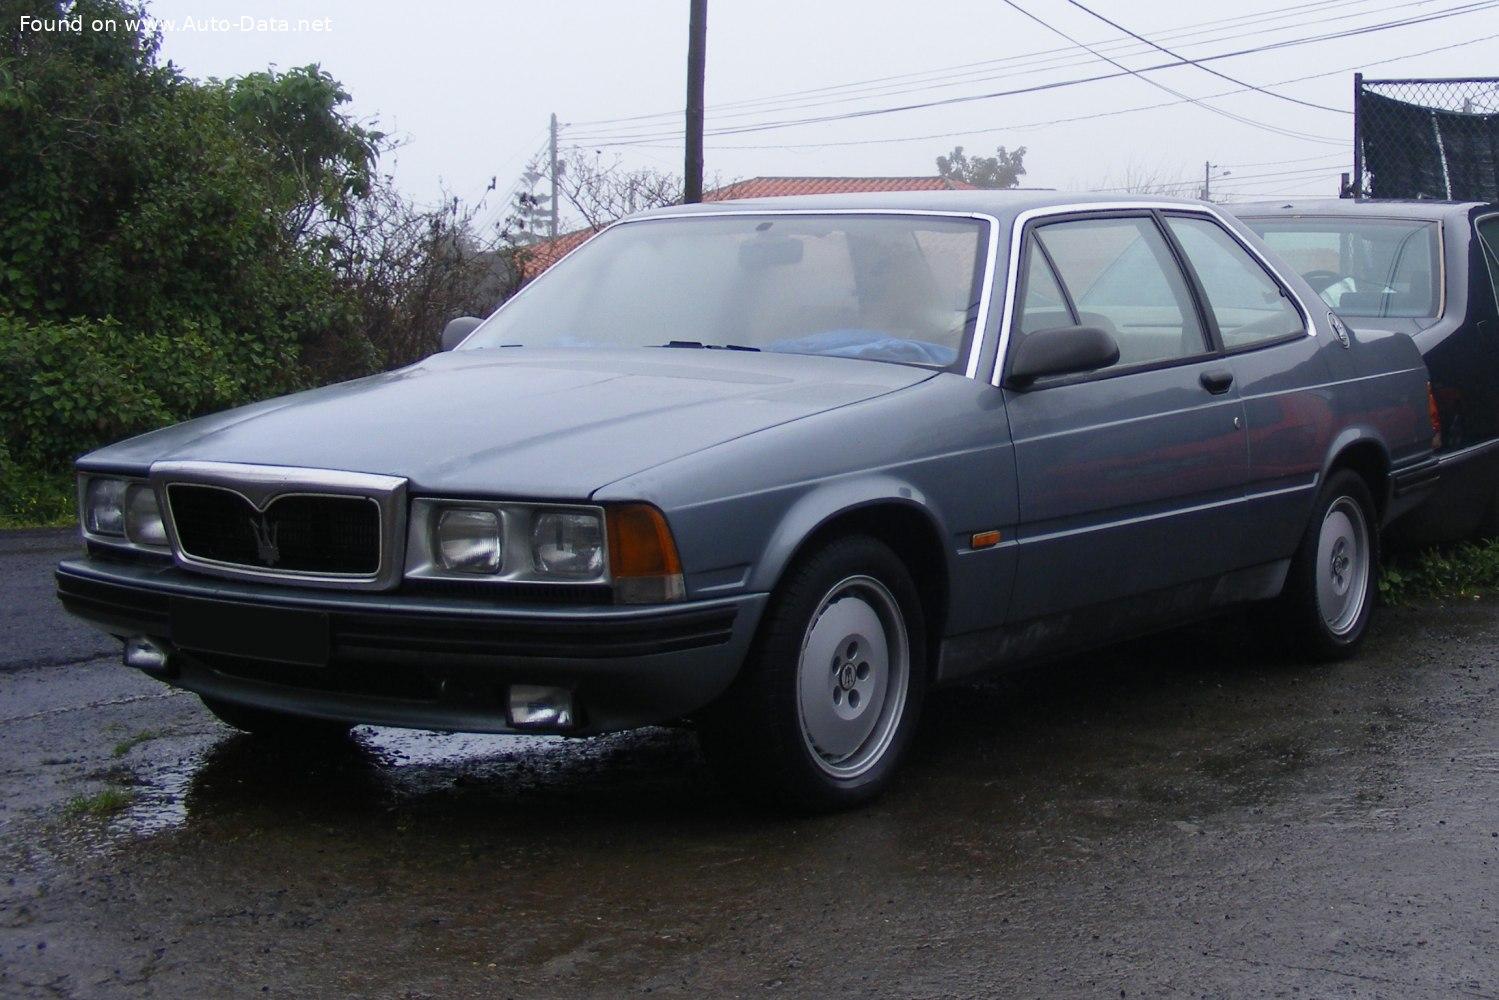 1986 Maserati 228 2.8 i V6 Turbo (225 Hp) | Technical specs, data, fuel consumption, Dimensions